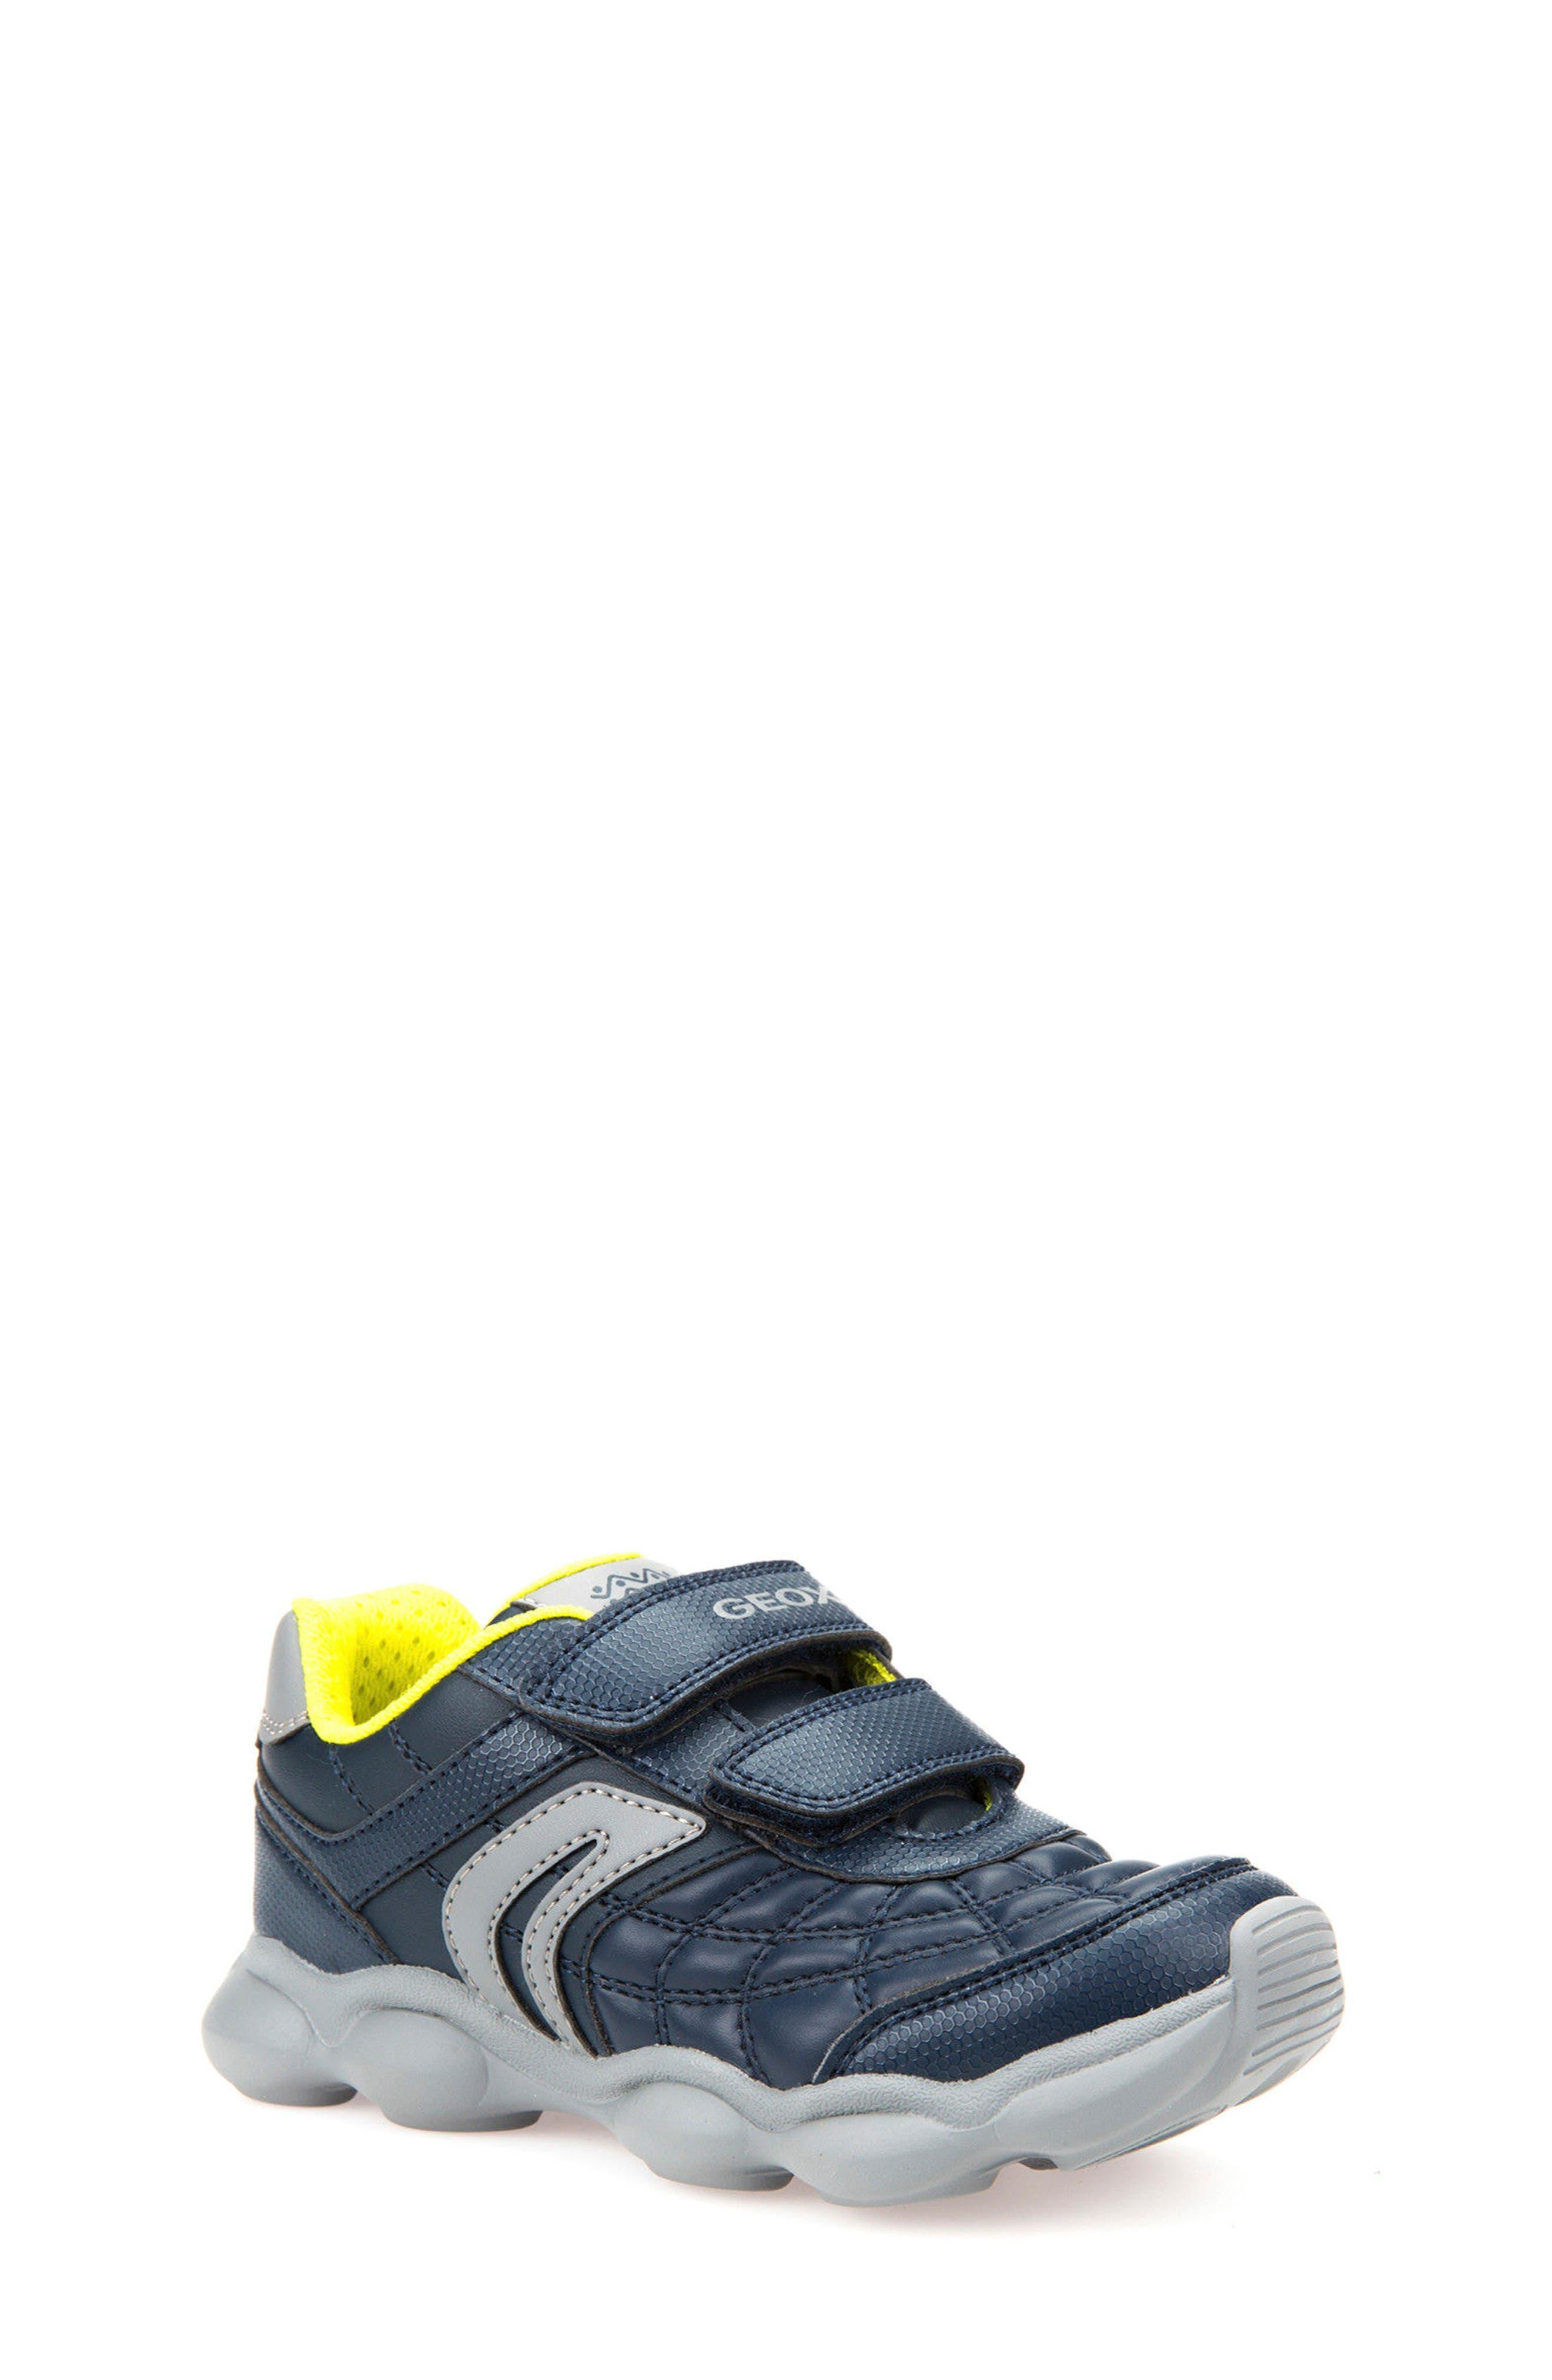 Munfrey Sneaker,                         Main,                         color, Navy/ Grey